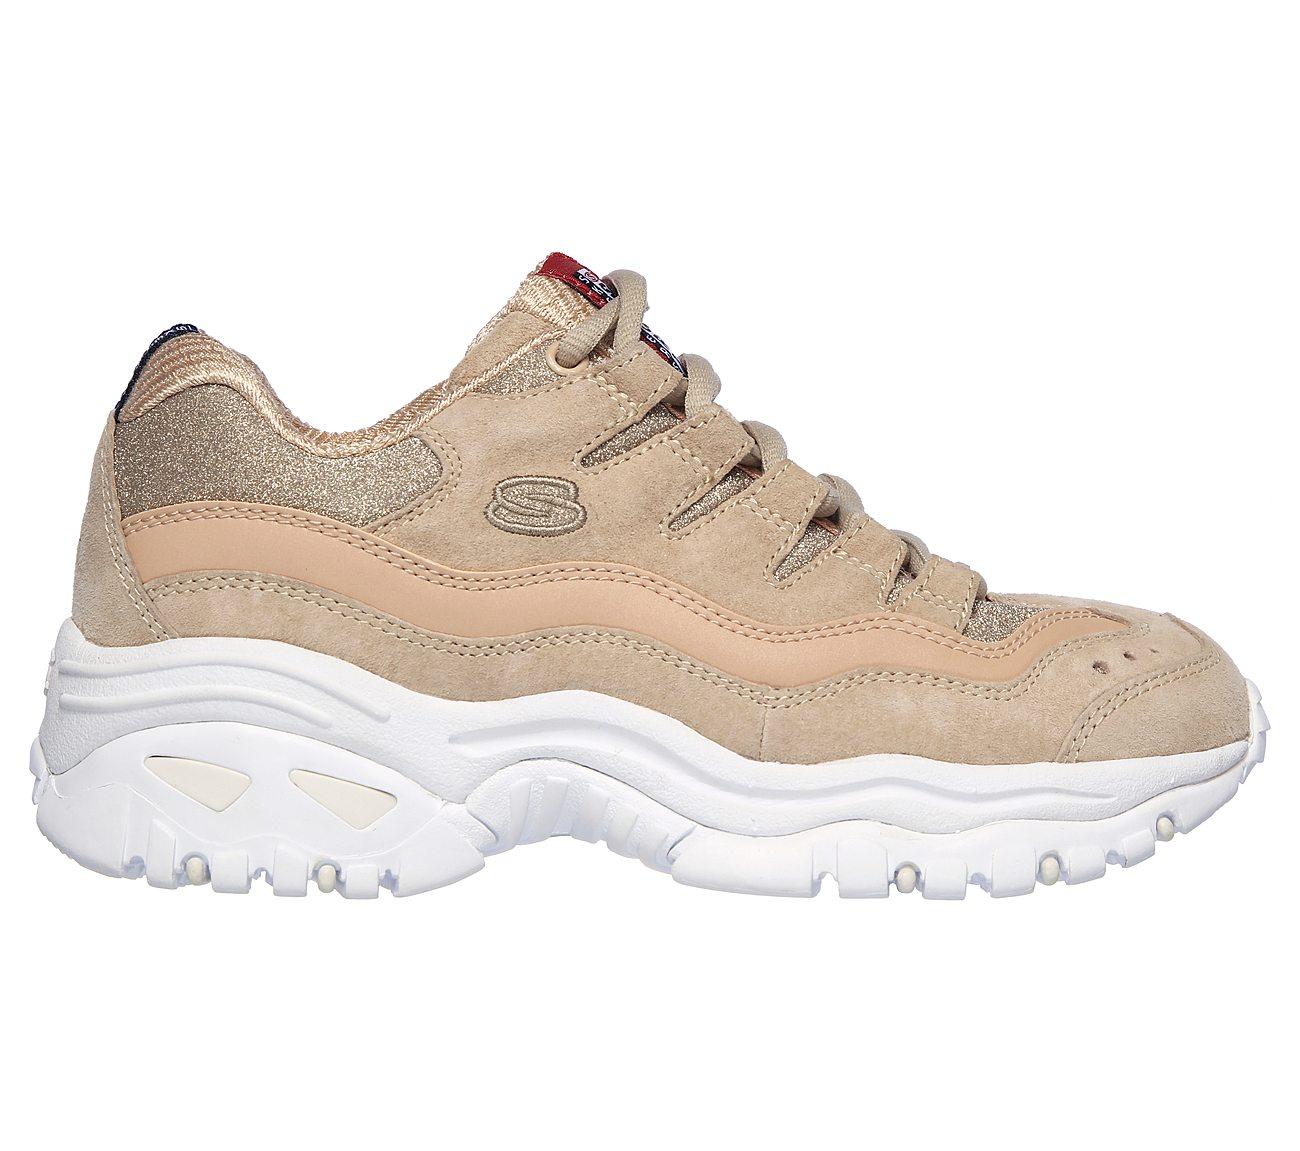 piel pasta recomendar  Buy SKECHERS Energy - Dazzle Glitter Sport Shoes